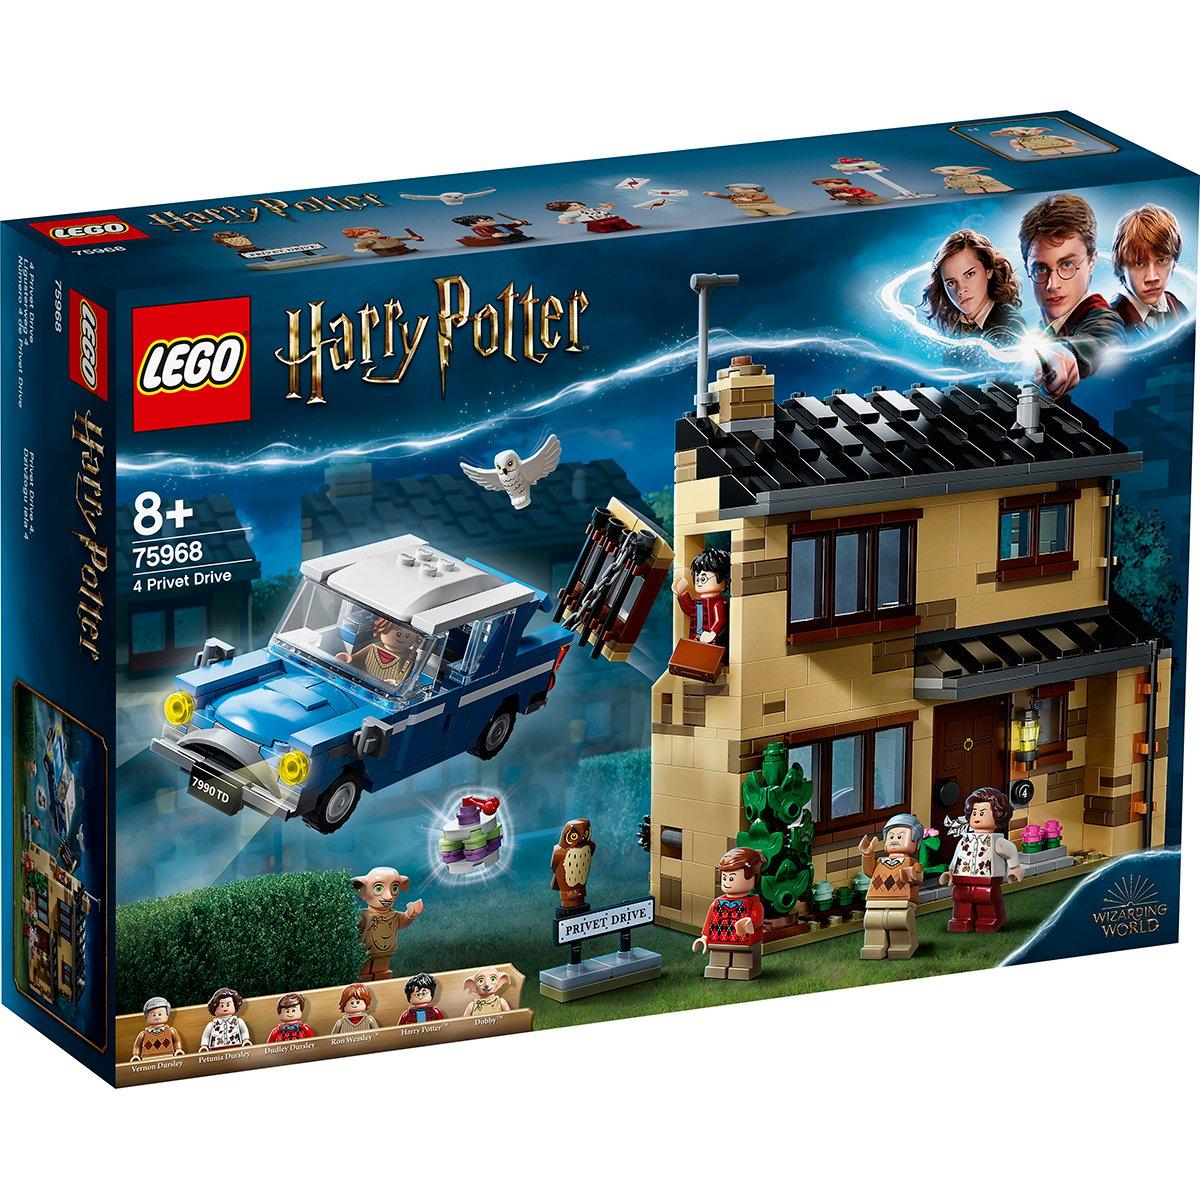 Lego® Harry Potter™ - 4 Privet Drive (75968)